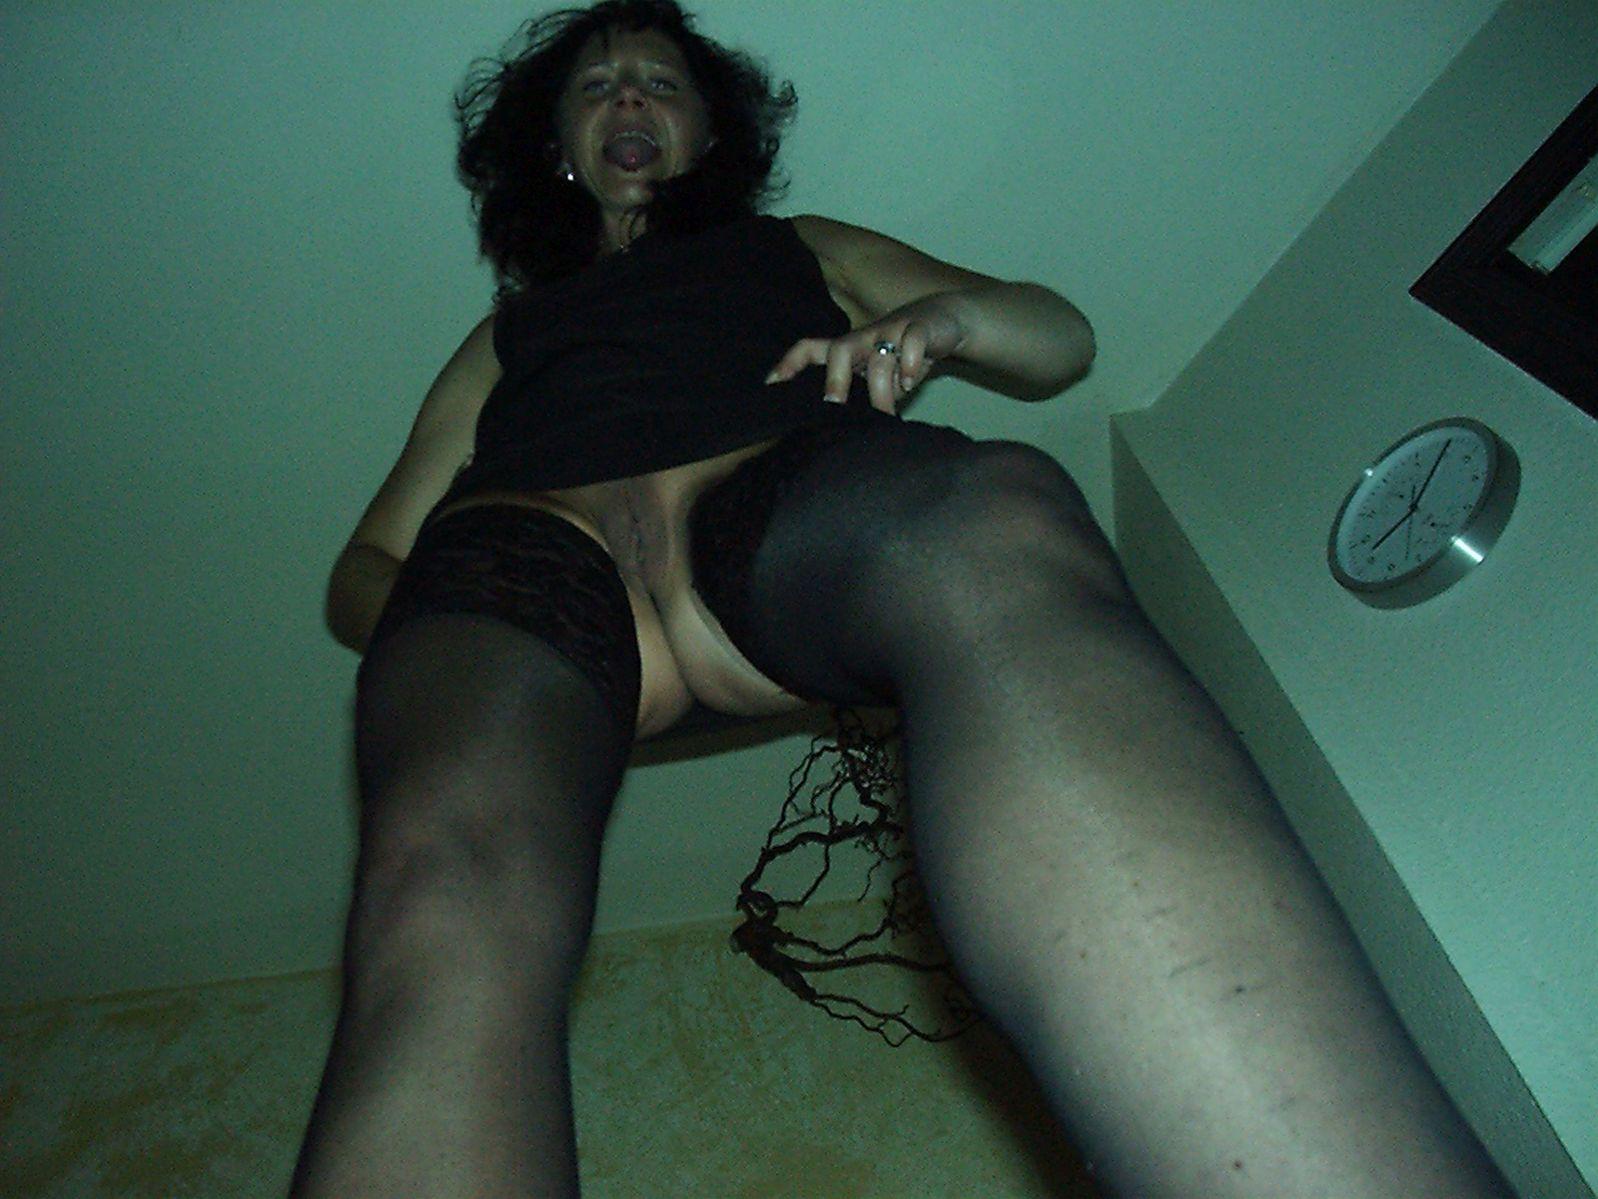 Upskirtfoto